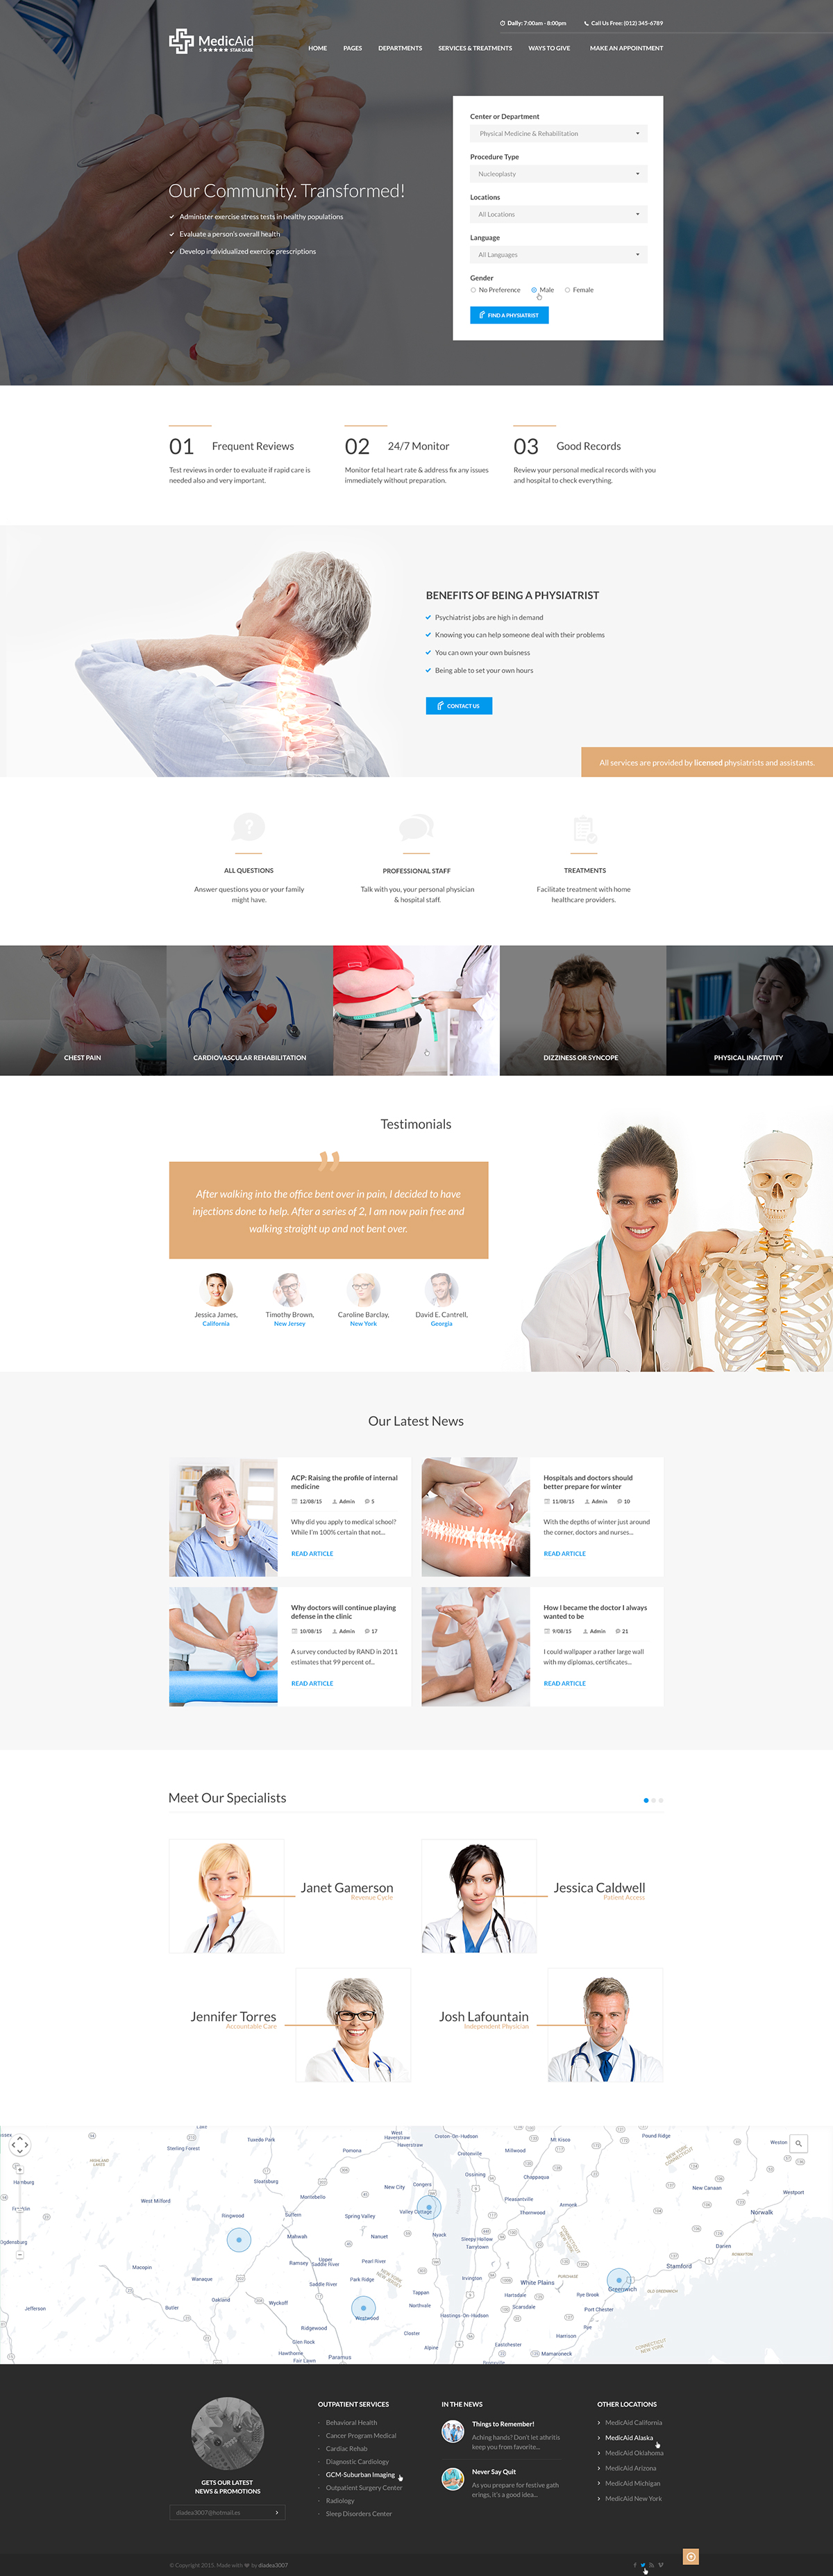 clinic dentist doctor gynecology Health hospital laboratory medic medical medicine patient physiatrist psychologist Treatment